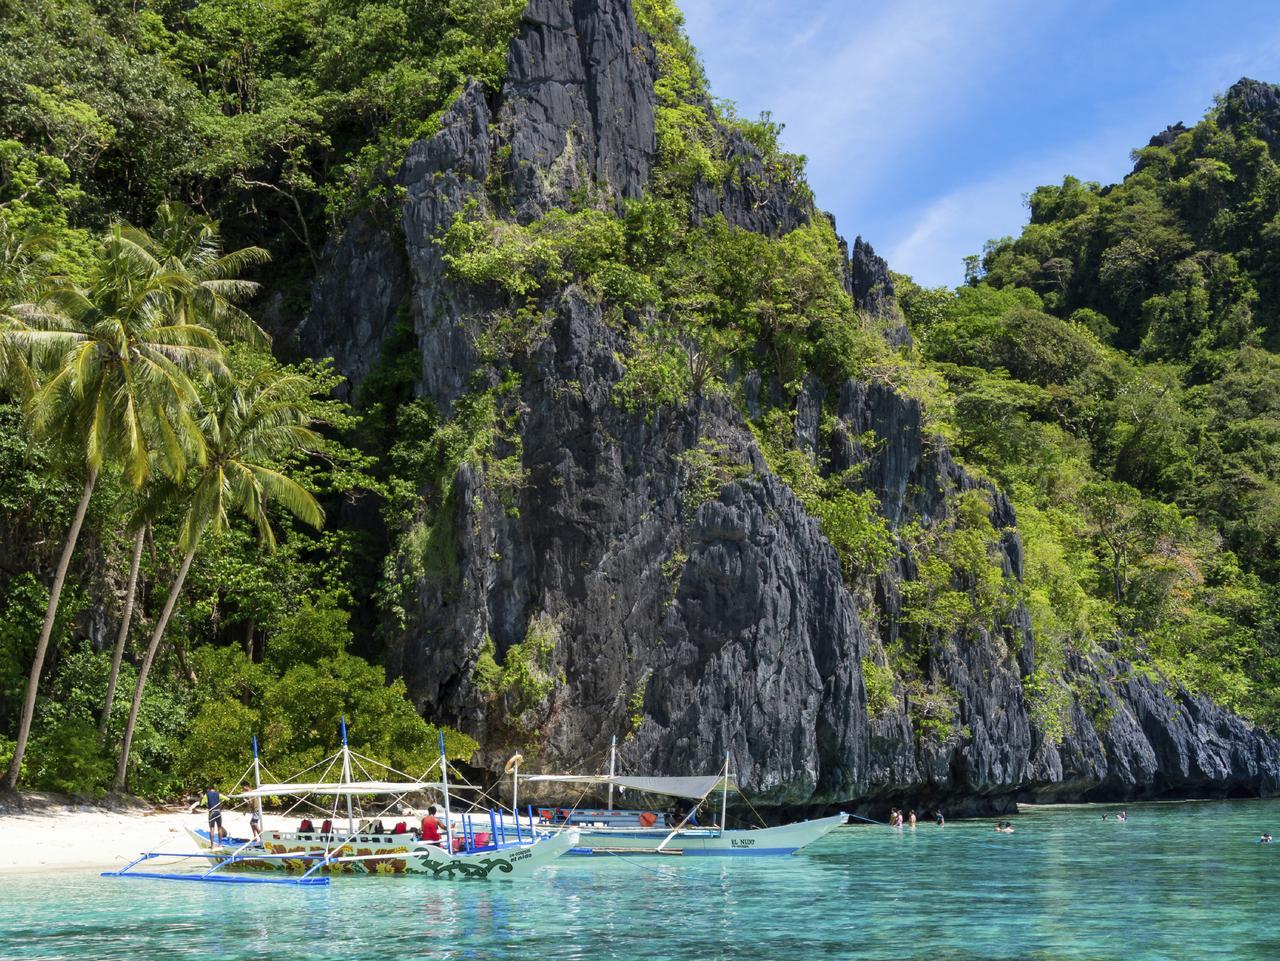 Small beach in El Nido, Palawan - Philippines